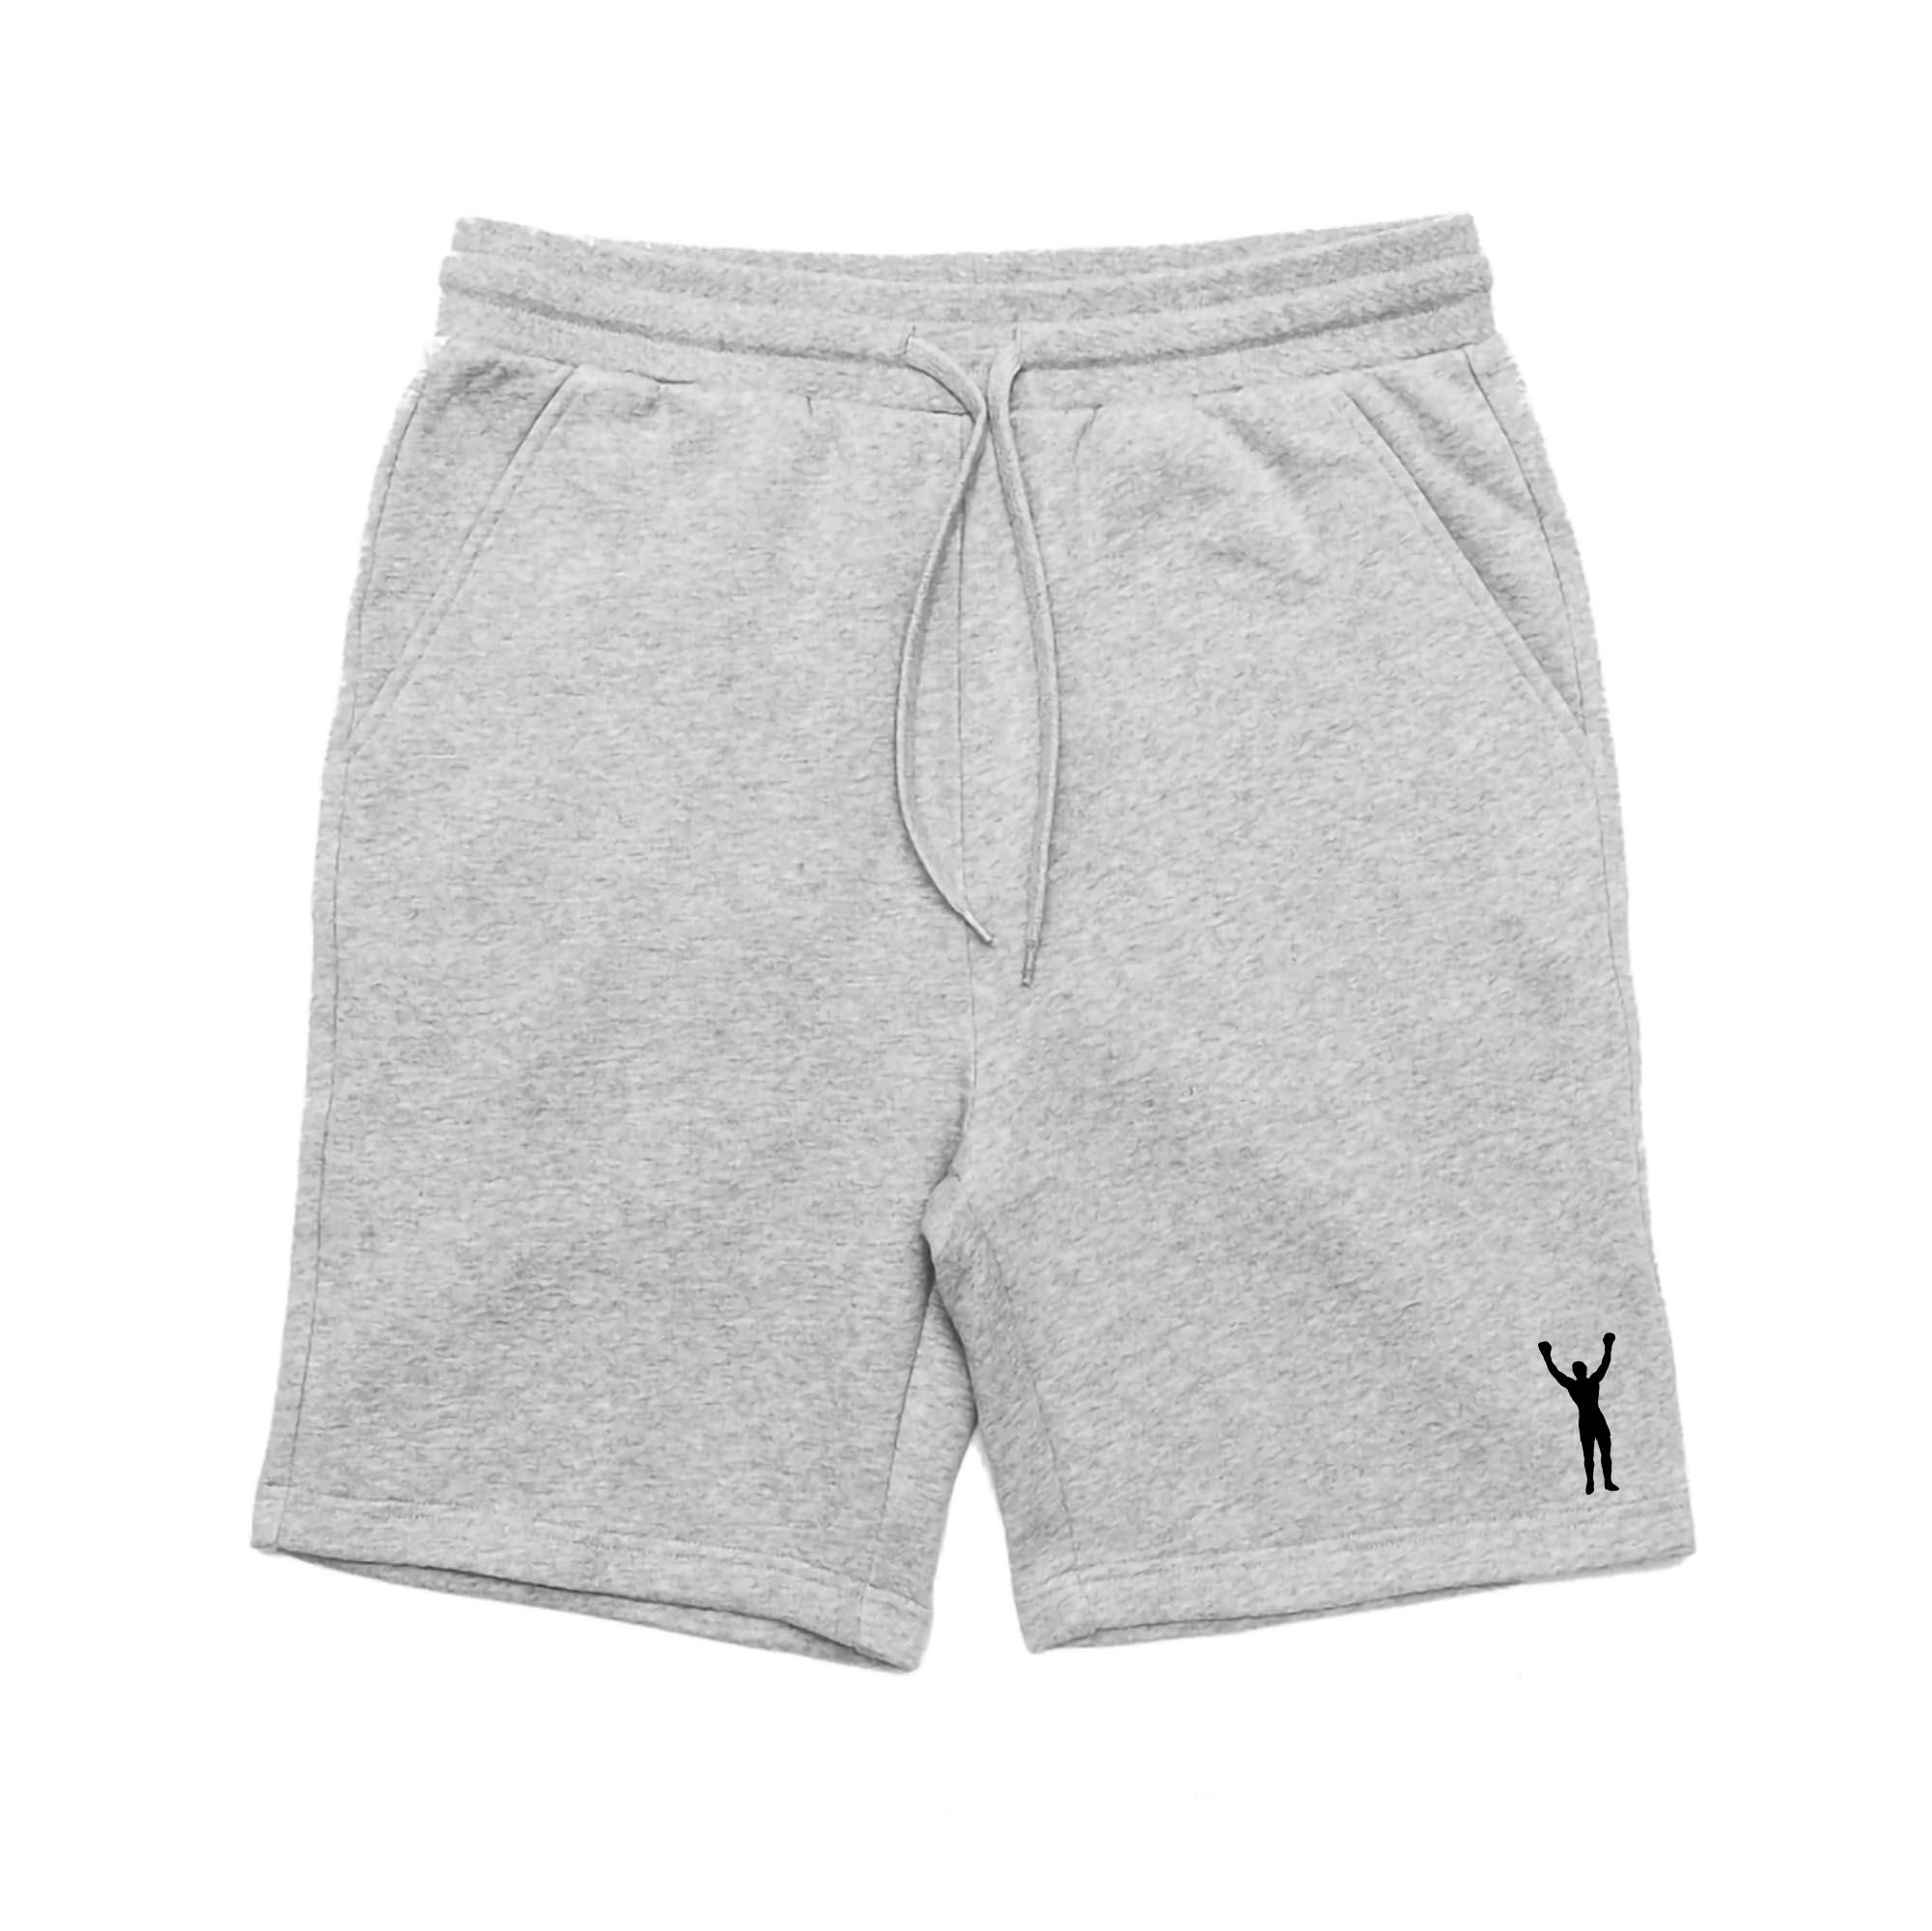 Rocky Statue Grey Shorts